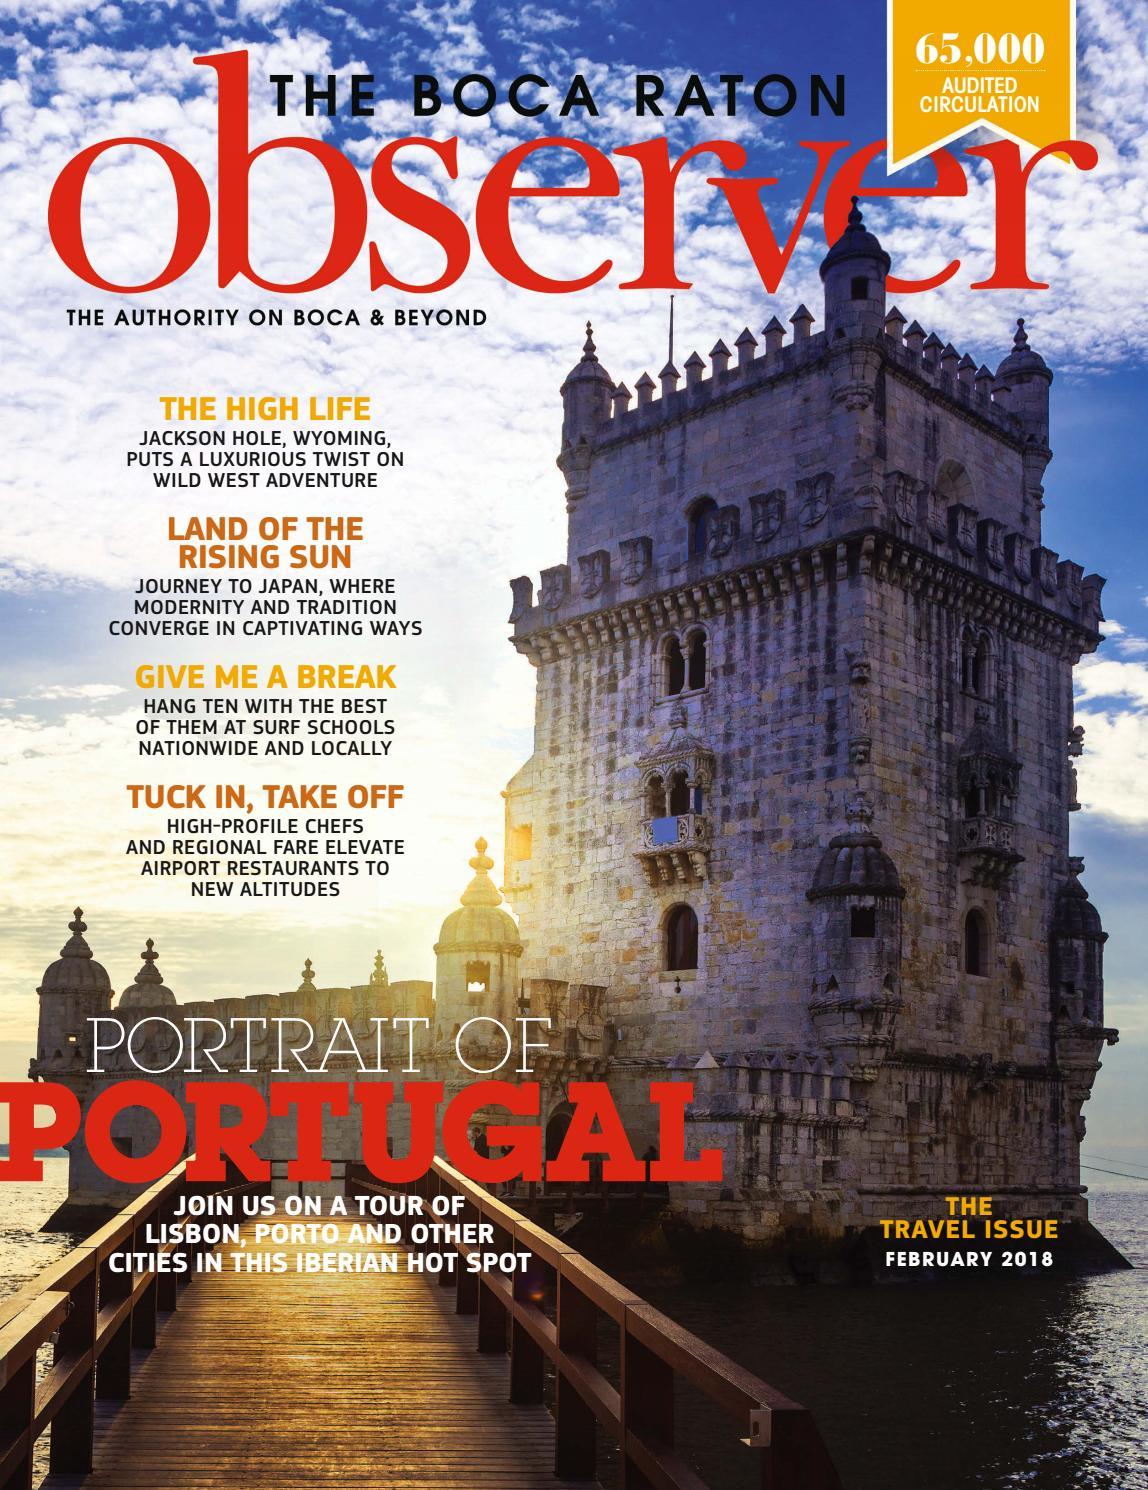 Boca Raton Observer Feb 2018 by Boca Raton Observer - issuu 6e0888fe62f